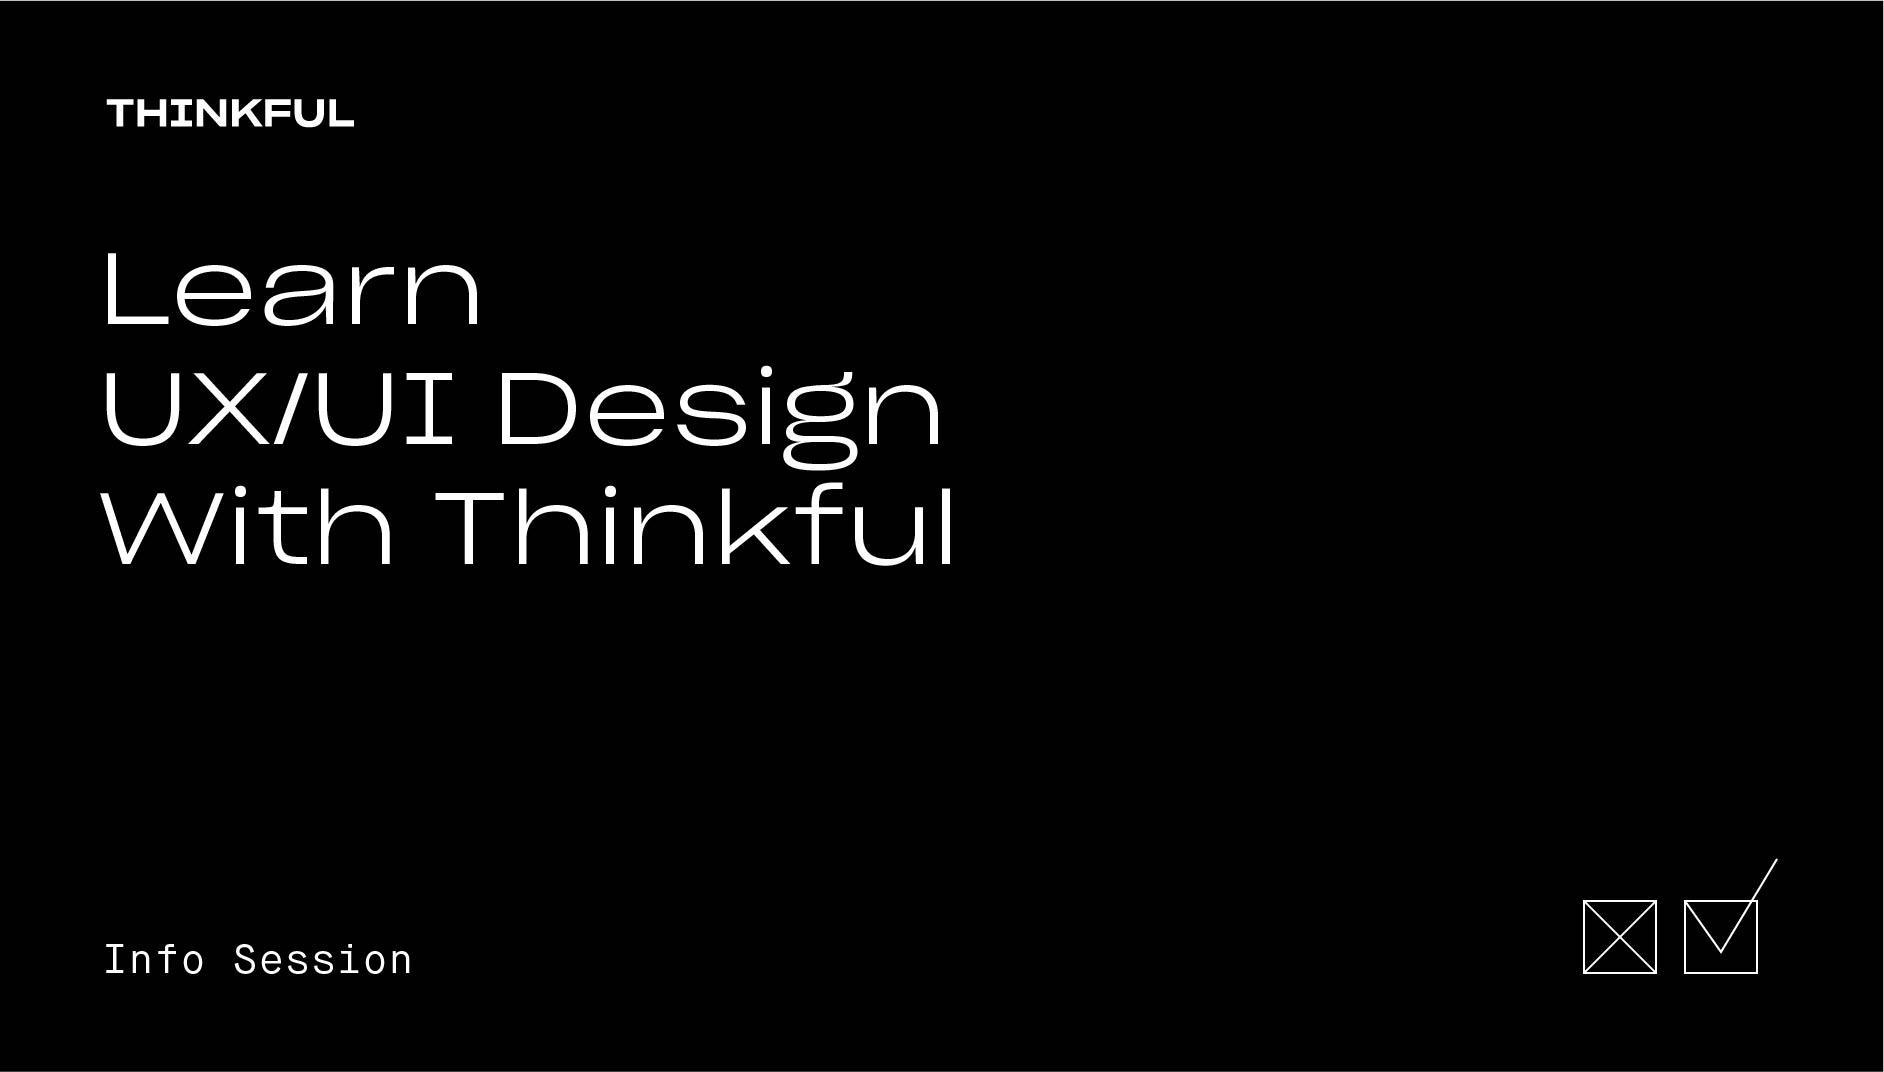 Thinkful Webinar | Learn UX/UI Design With Thinkful